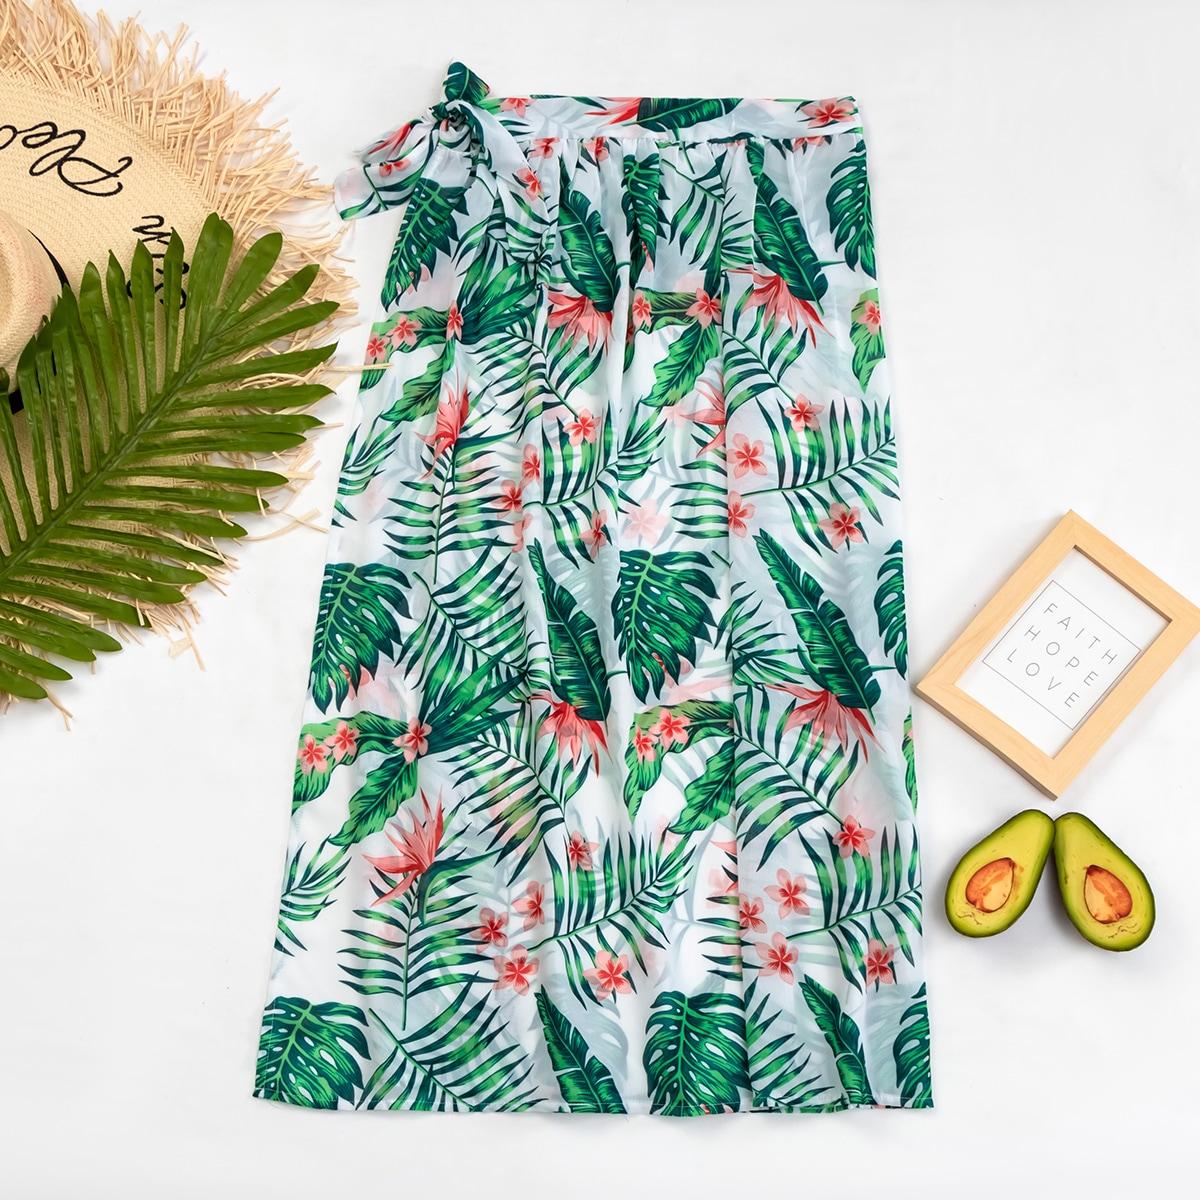 Юбка-накидка с тропическим принтом